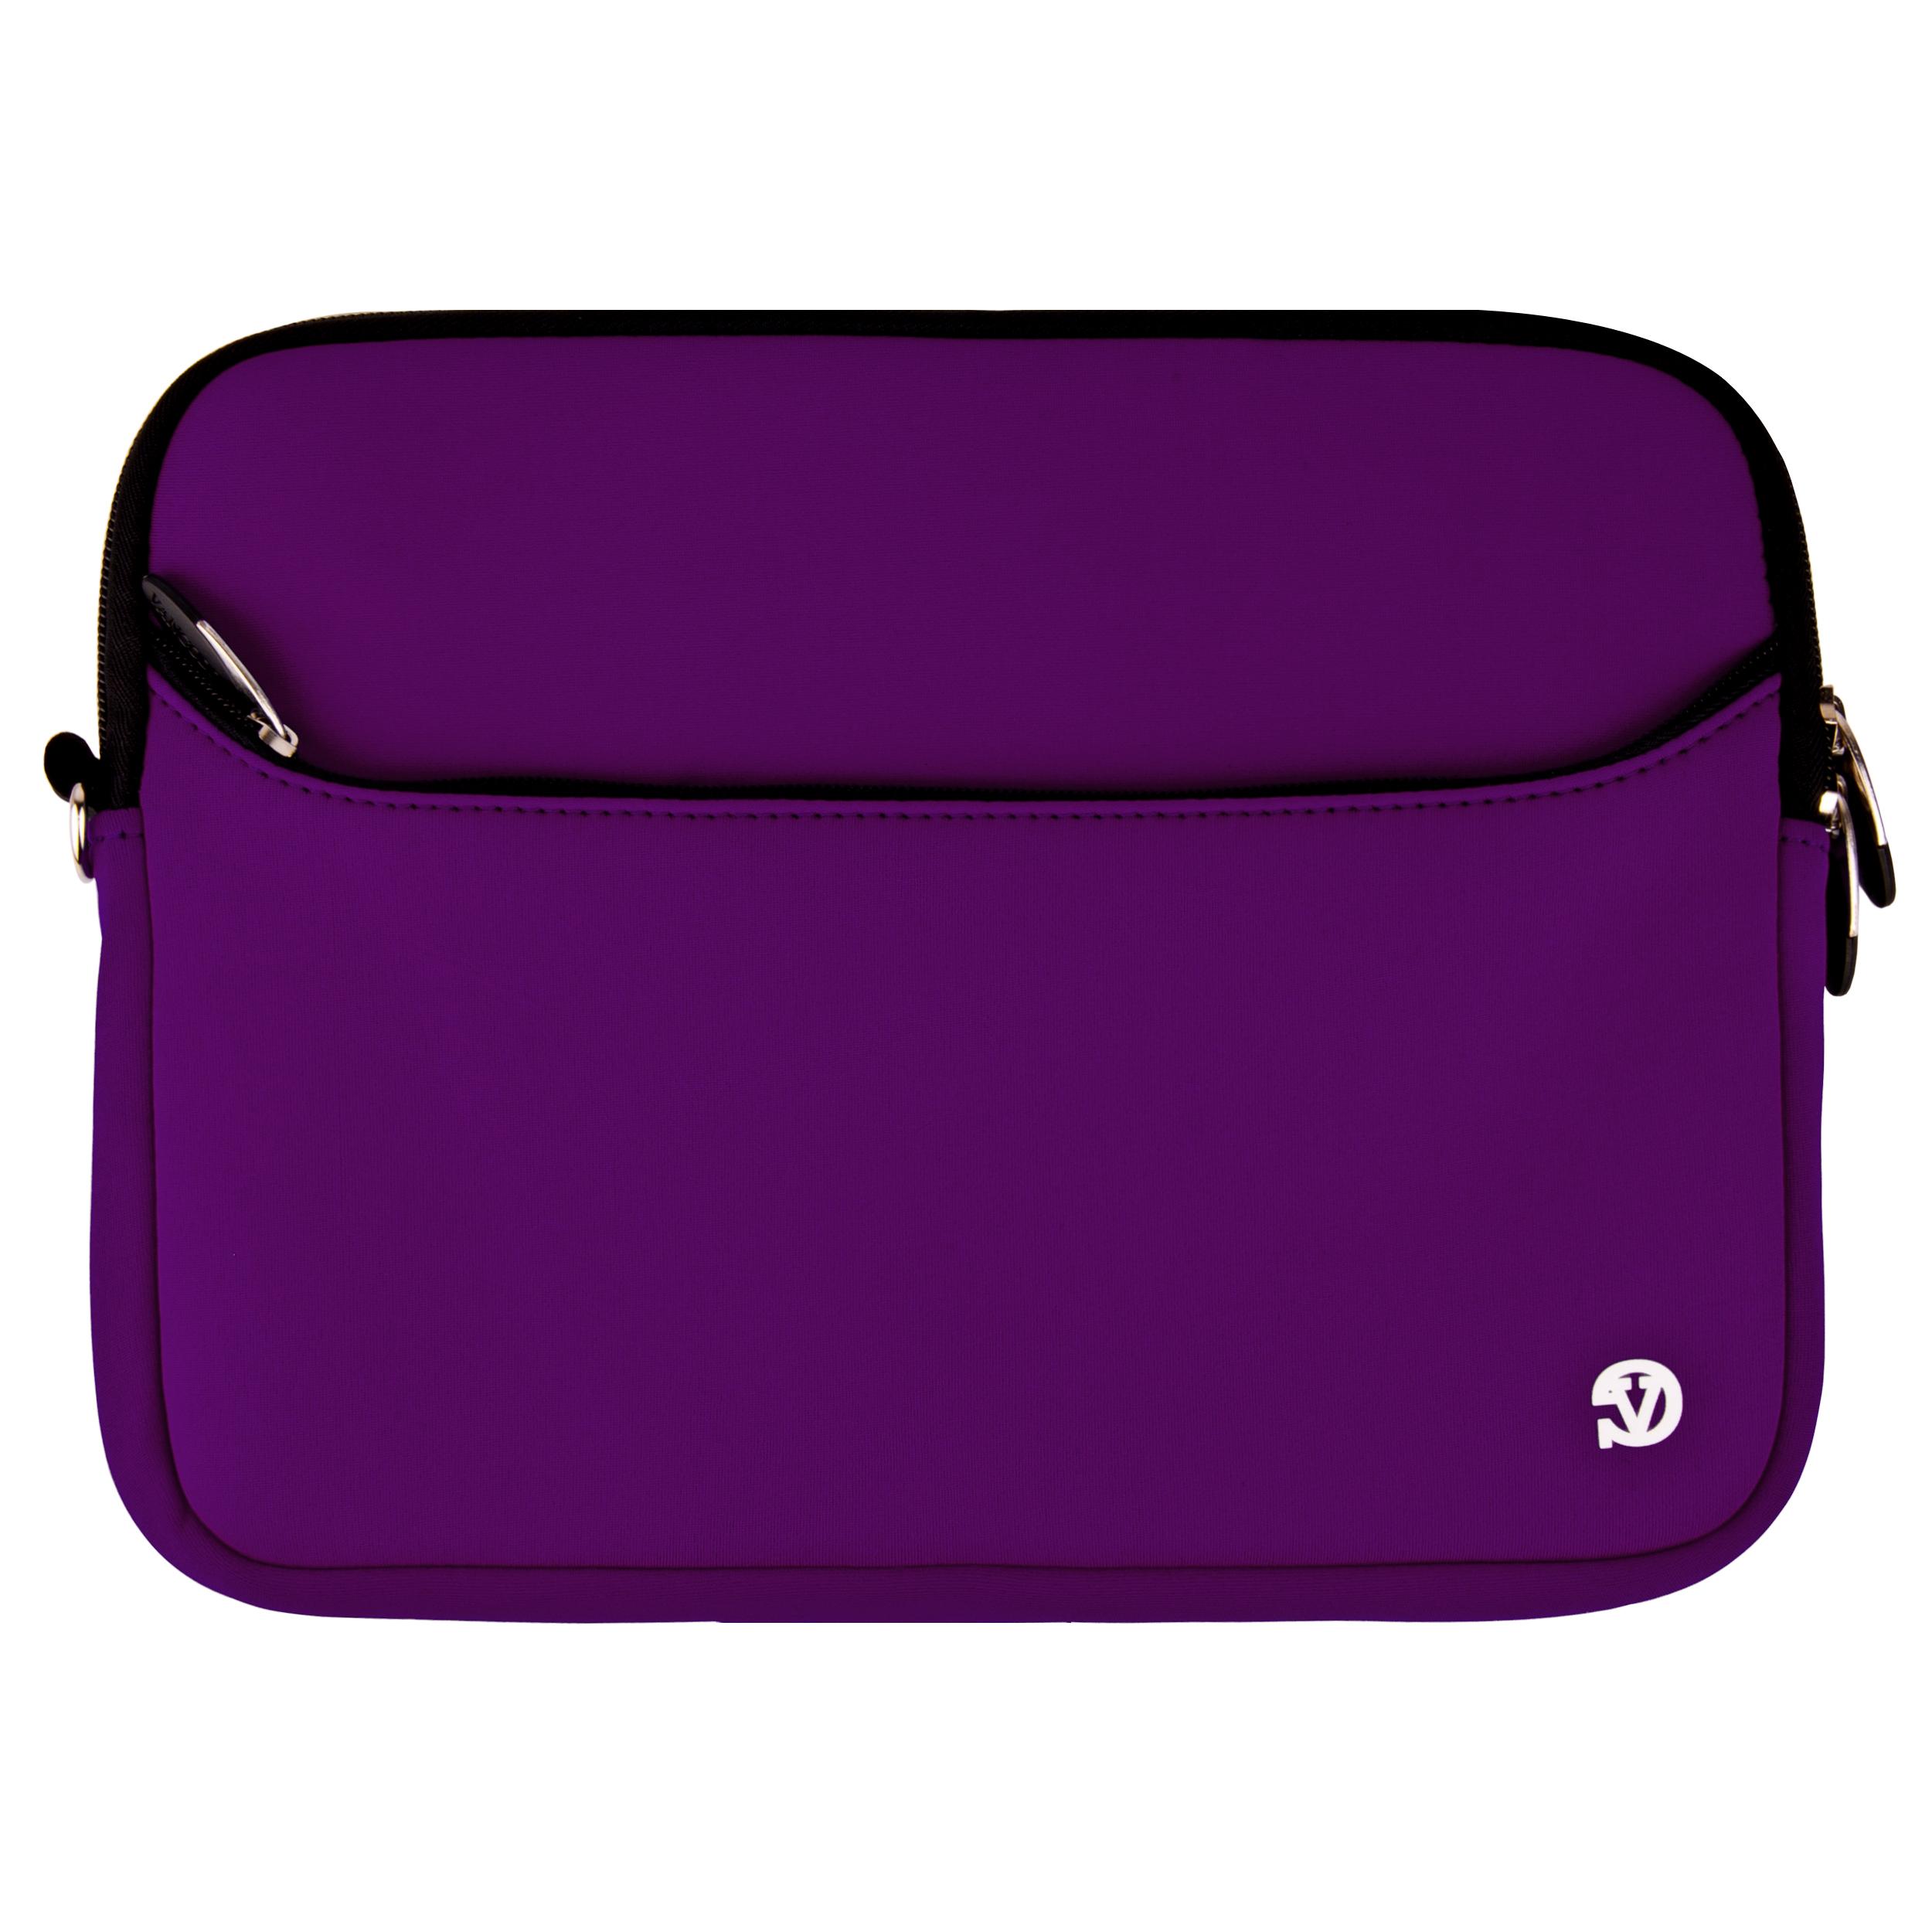 "Neoprene Sleeve 10"" (Purple/Black Trim)"